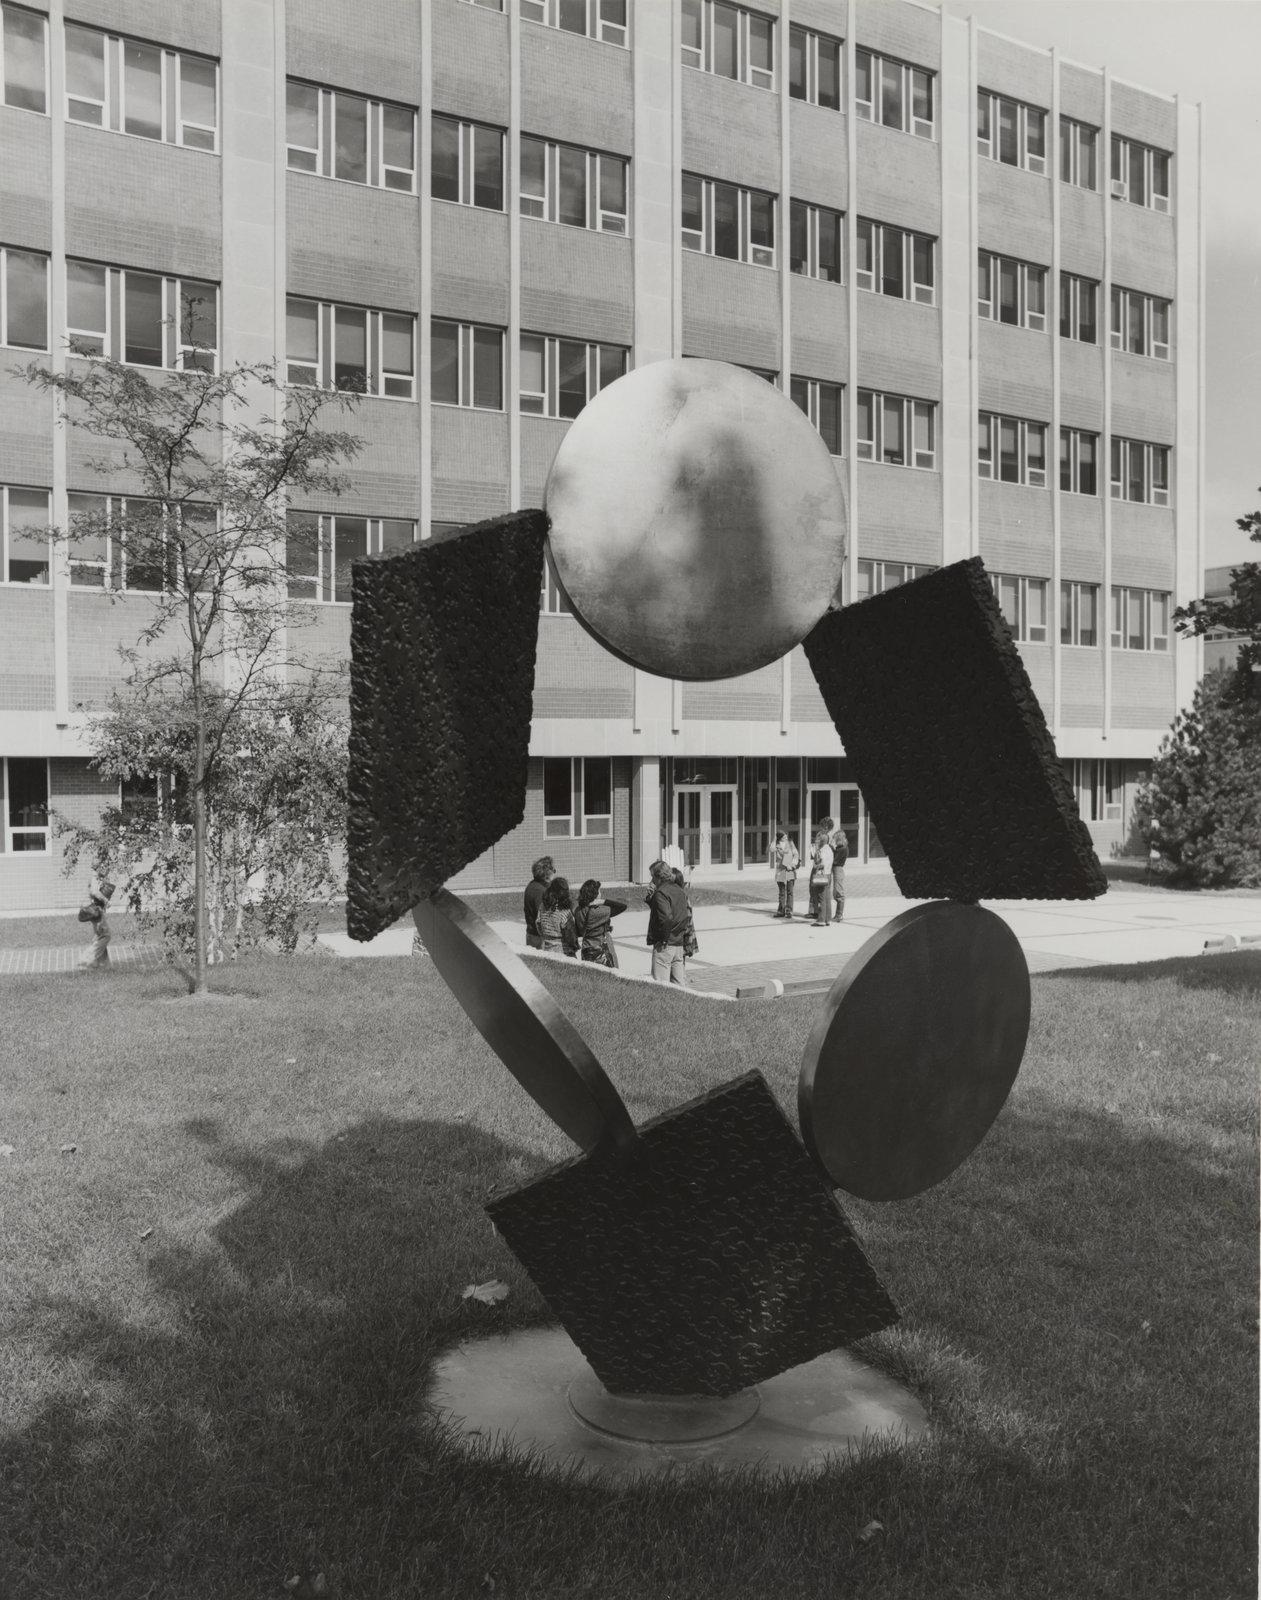 Metal sculpture on Wilfrid Laurier University campus